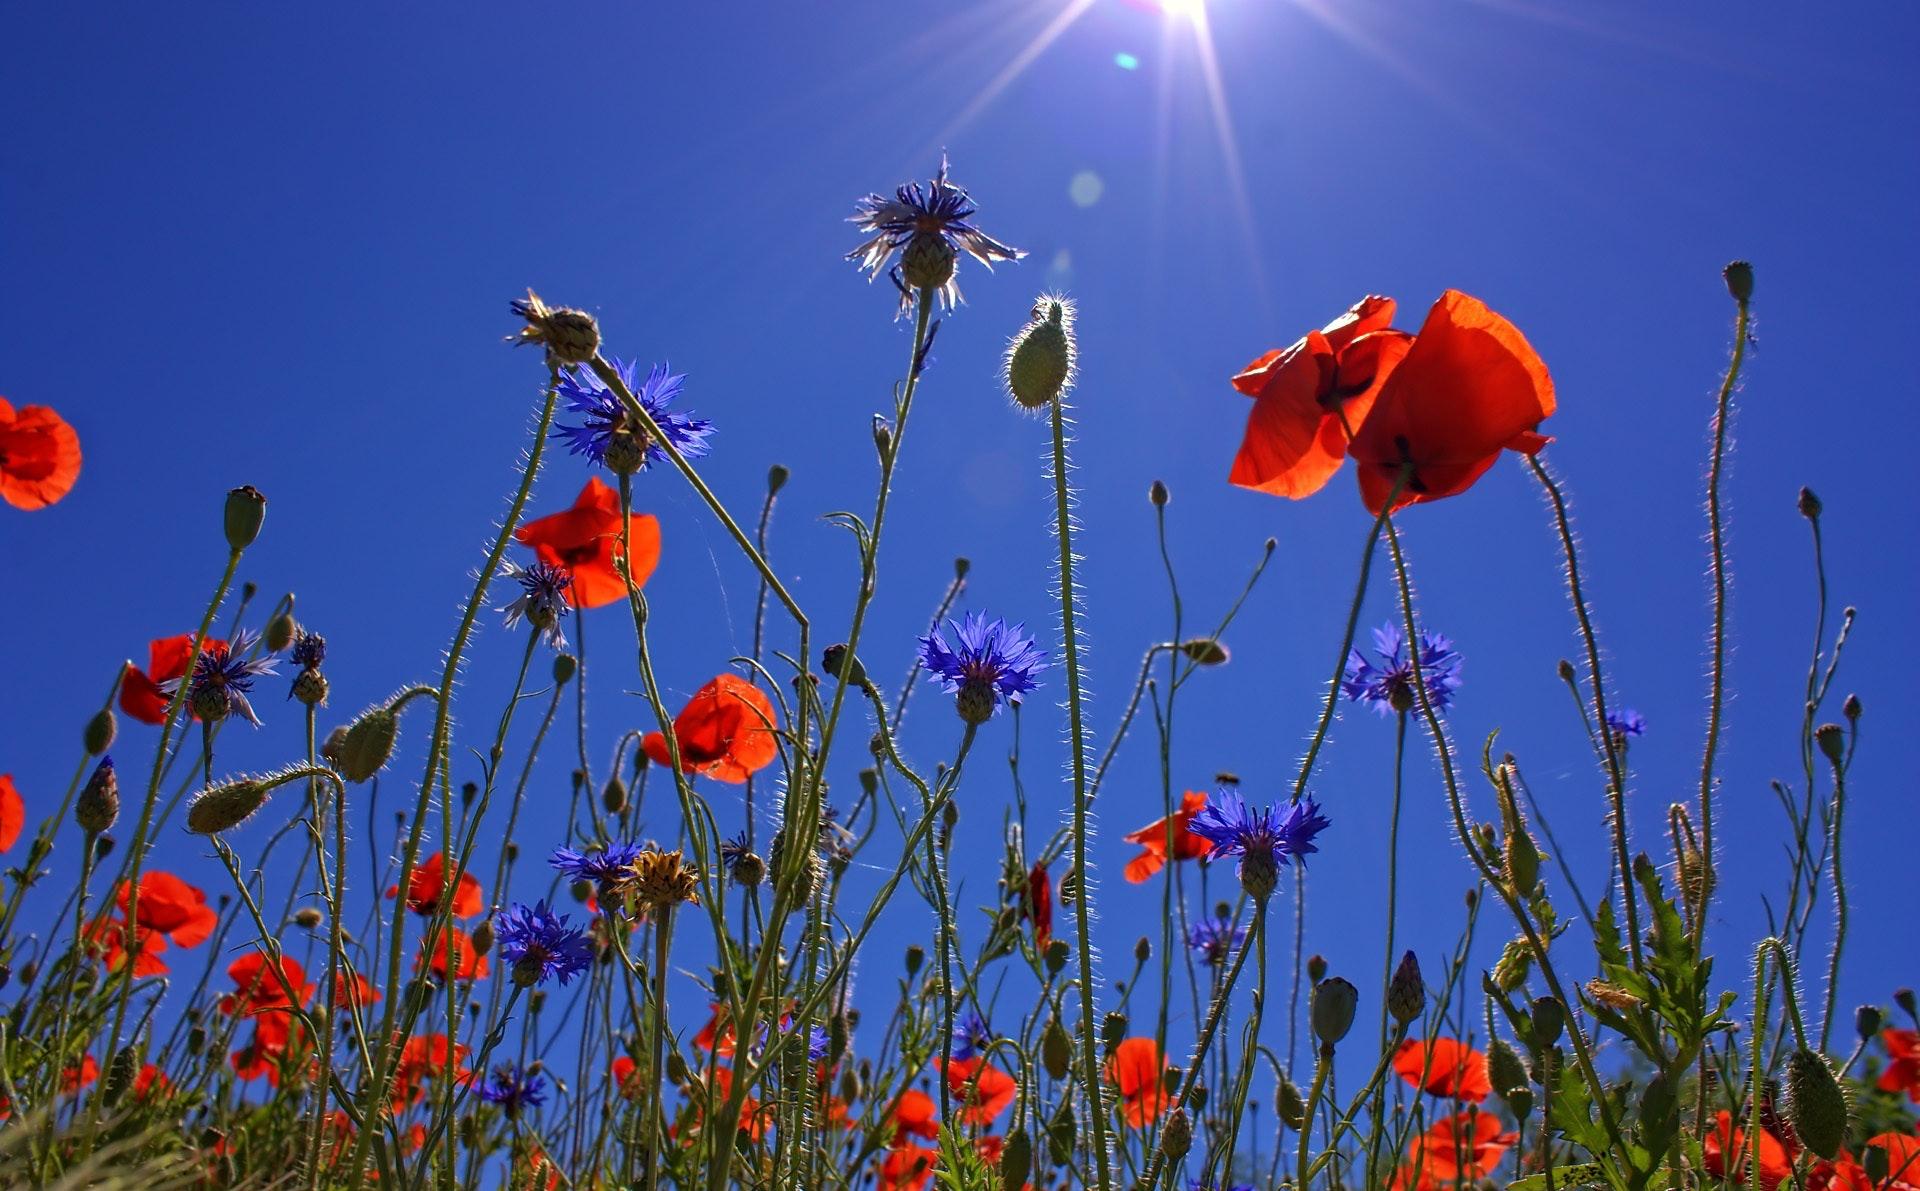 bloom-blossom-flora-35640